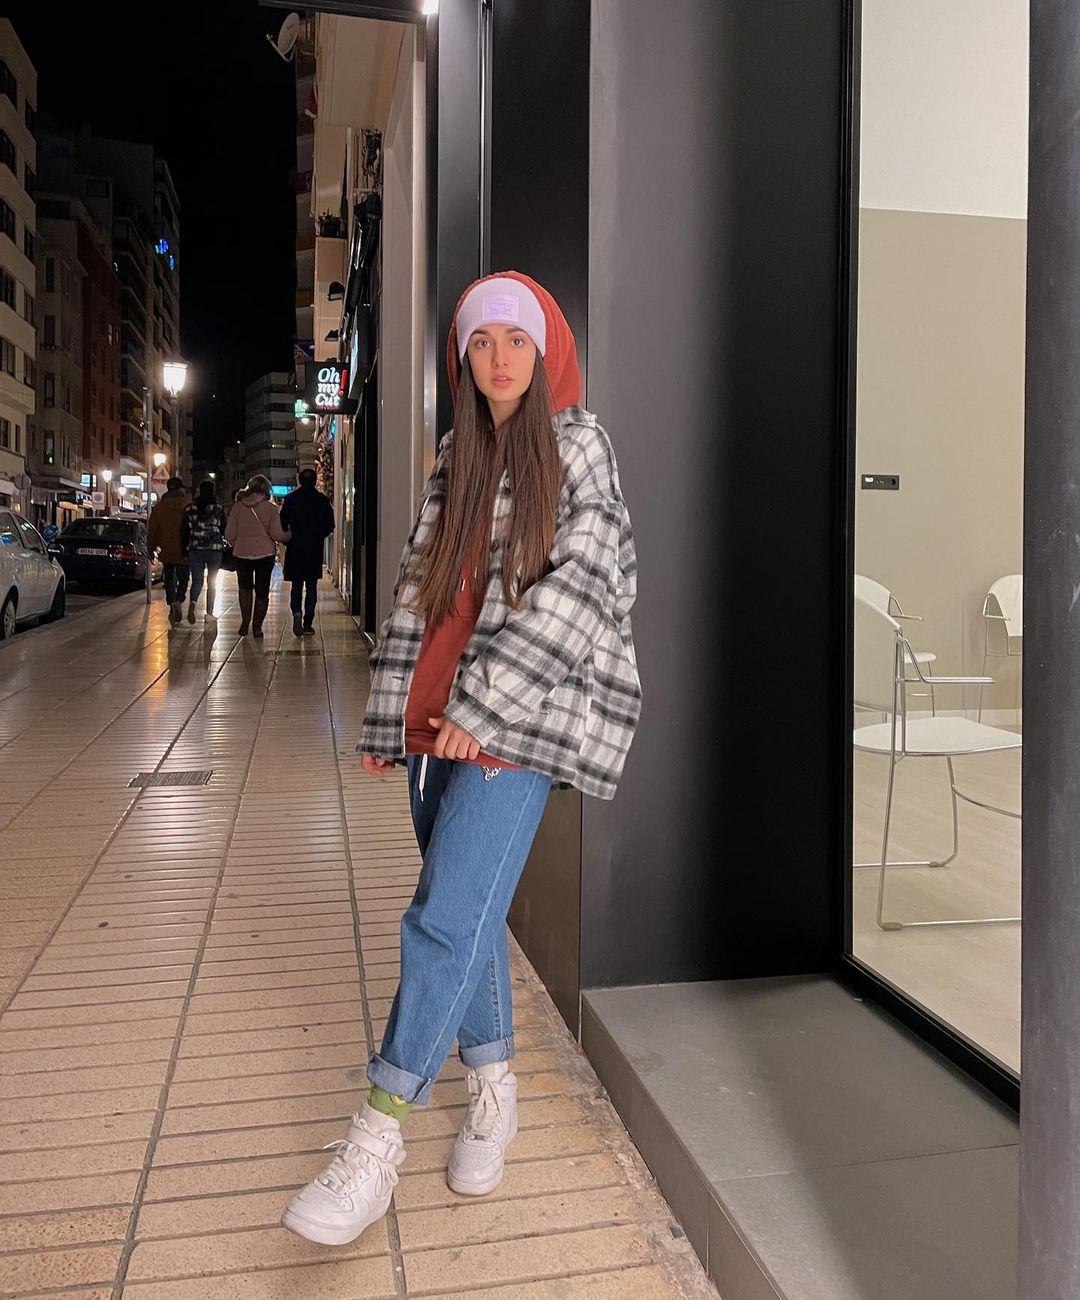 Andrea-Apalazon-Wallpapers-Insta-Fit-Bio-2